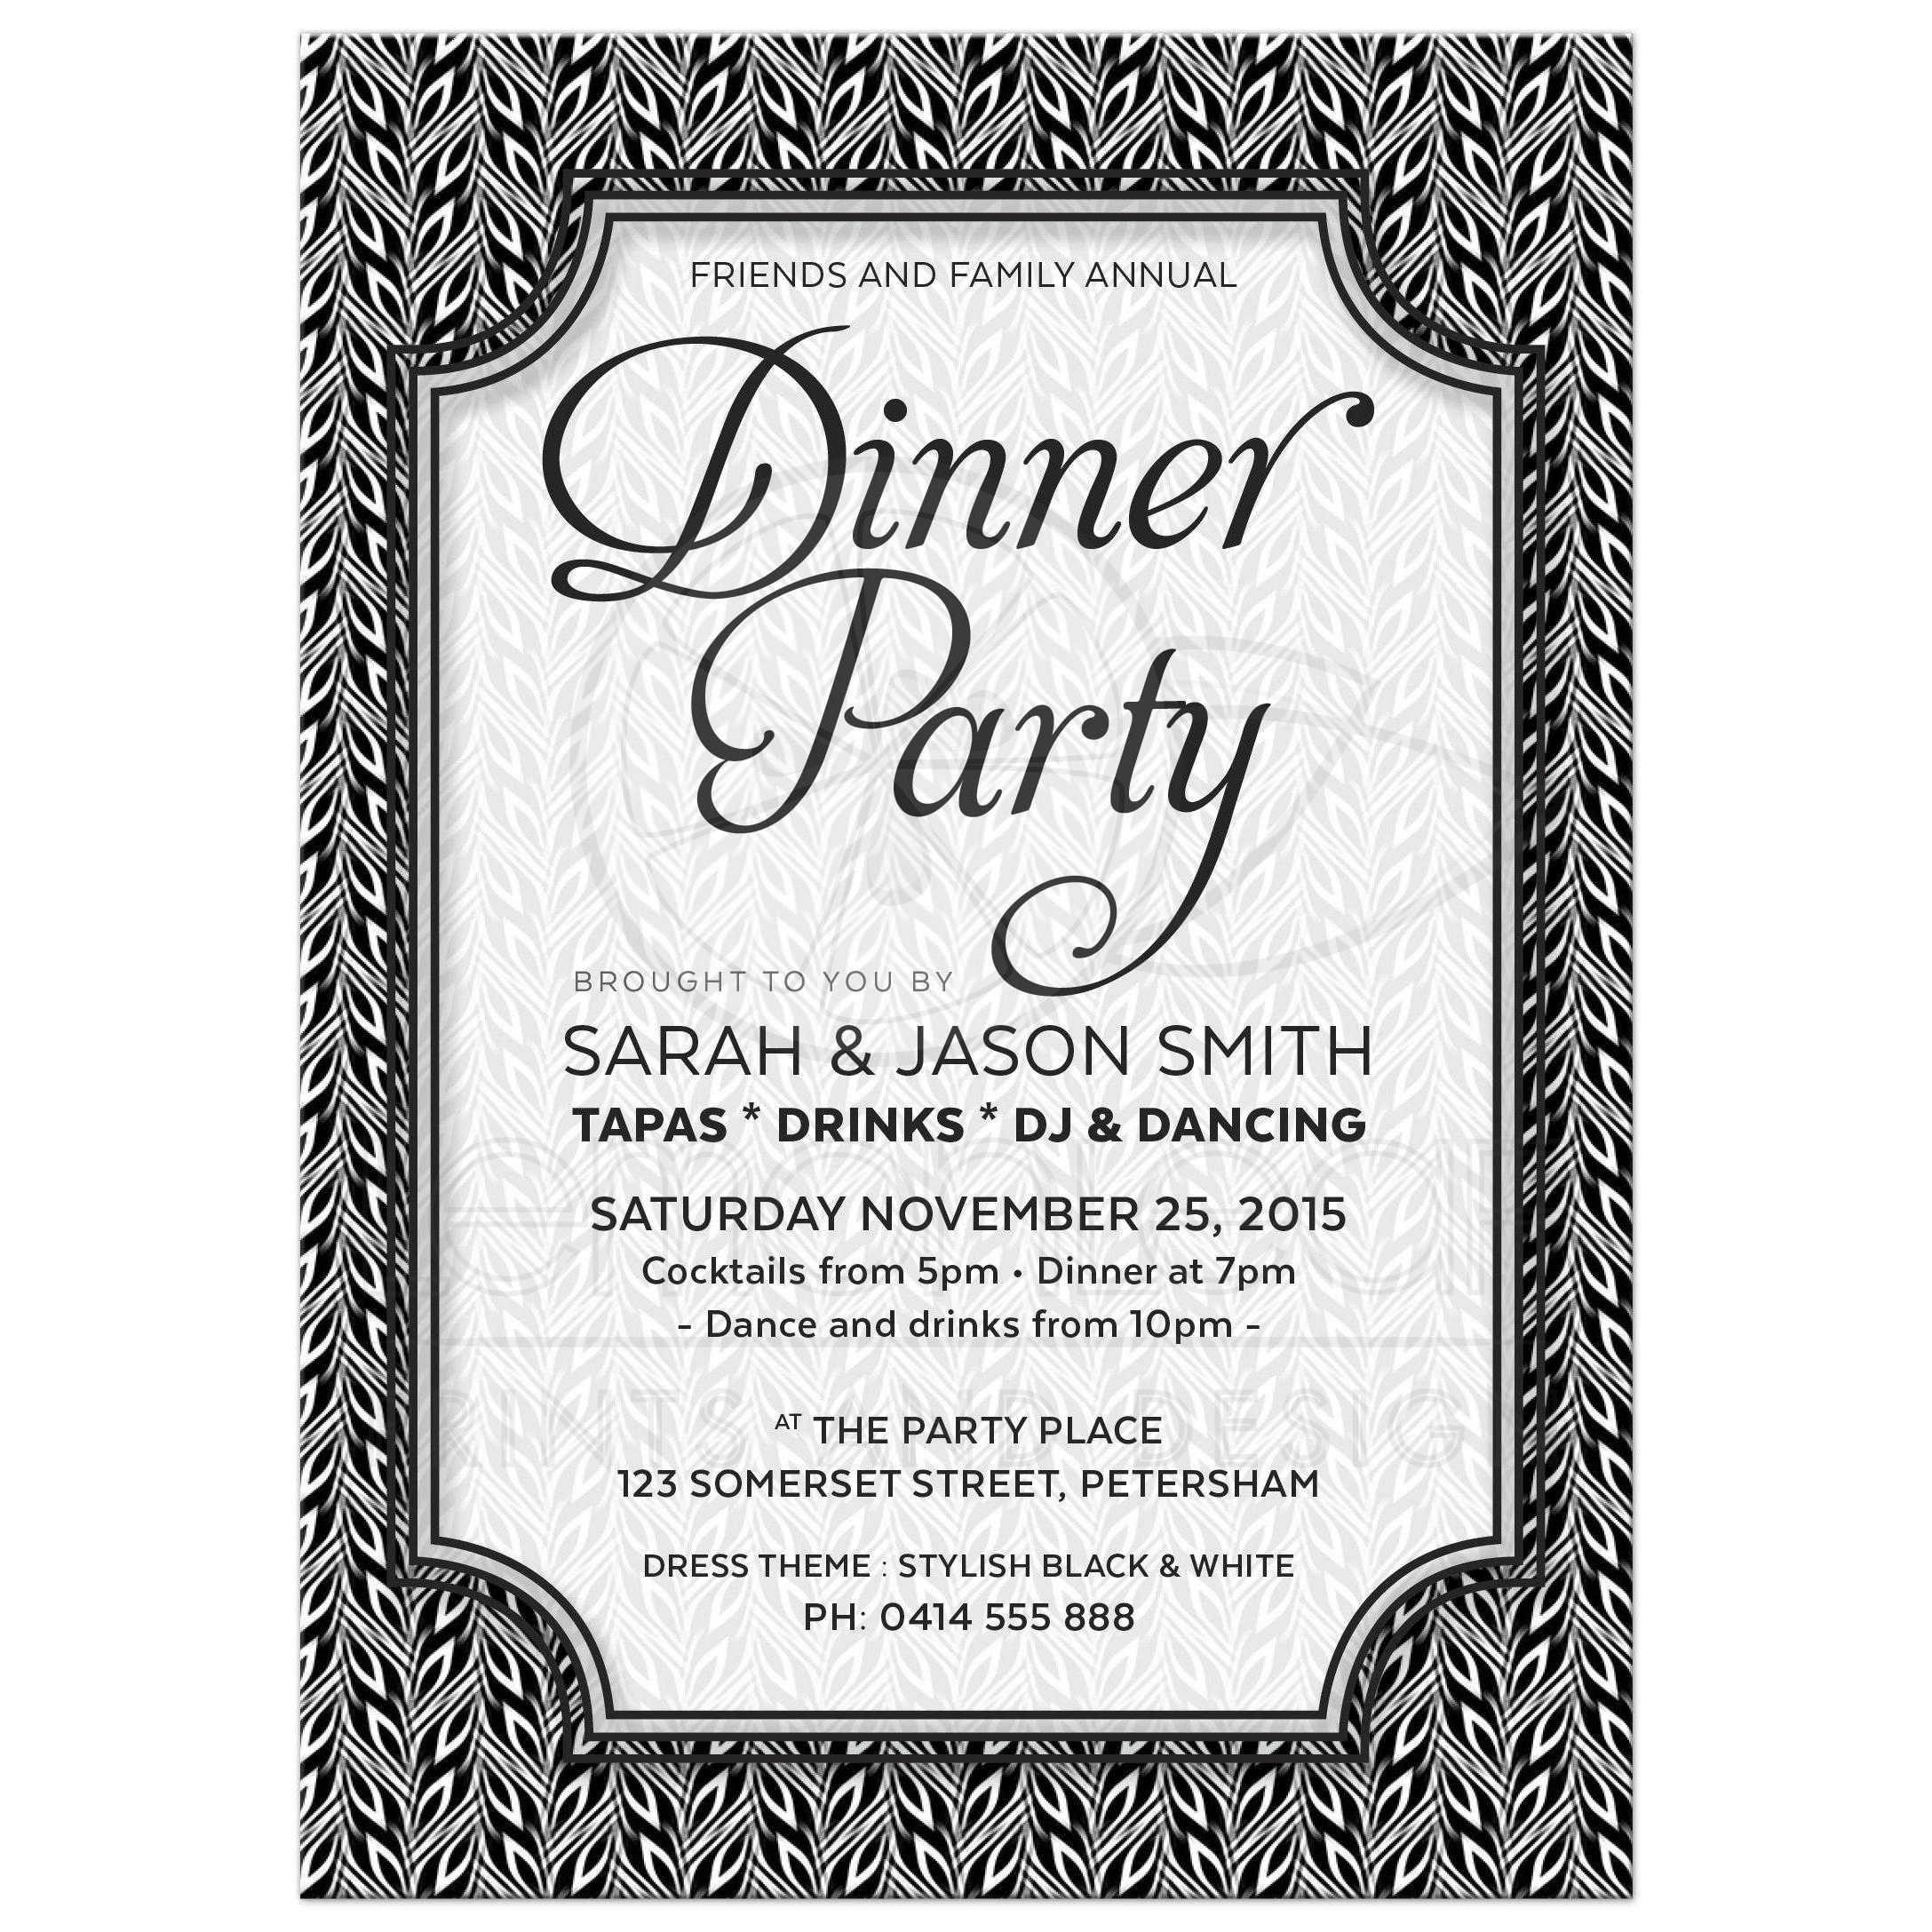 Dinner Party Invitation Sample construction contract template free – Sample Party Invitation Letter